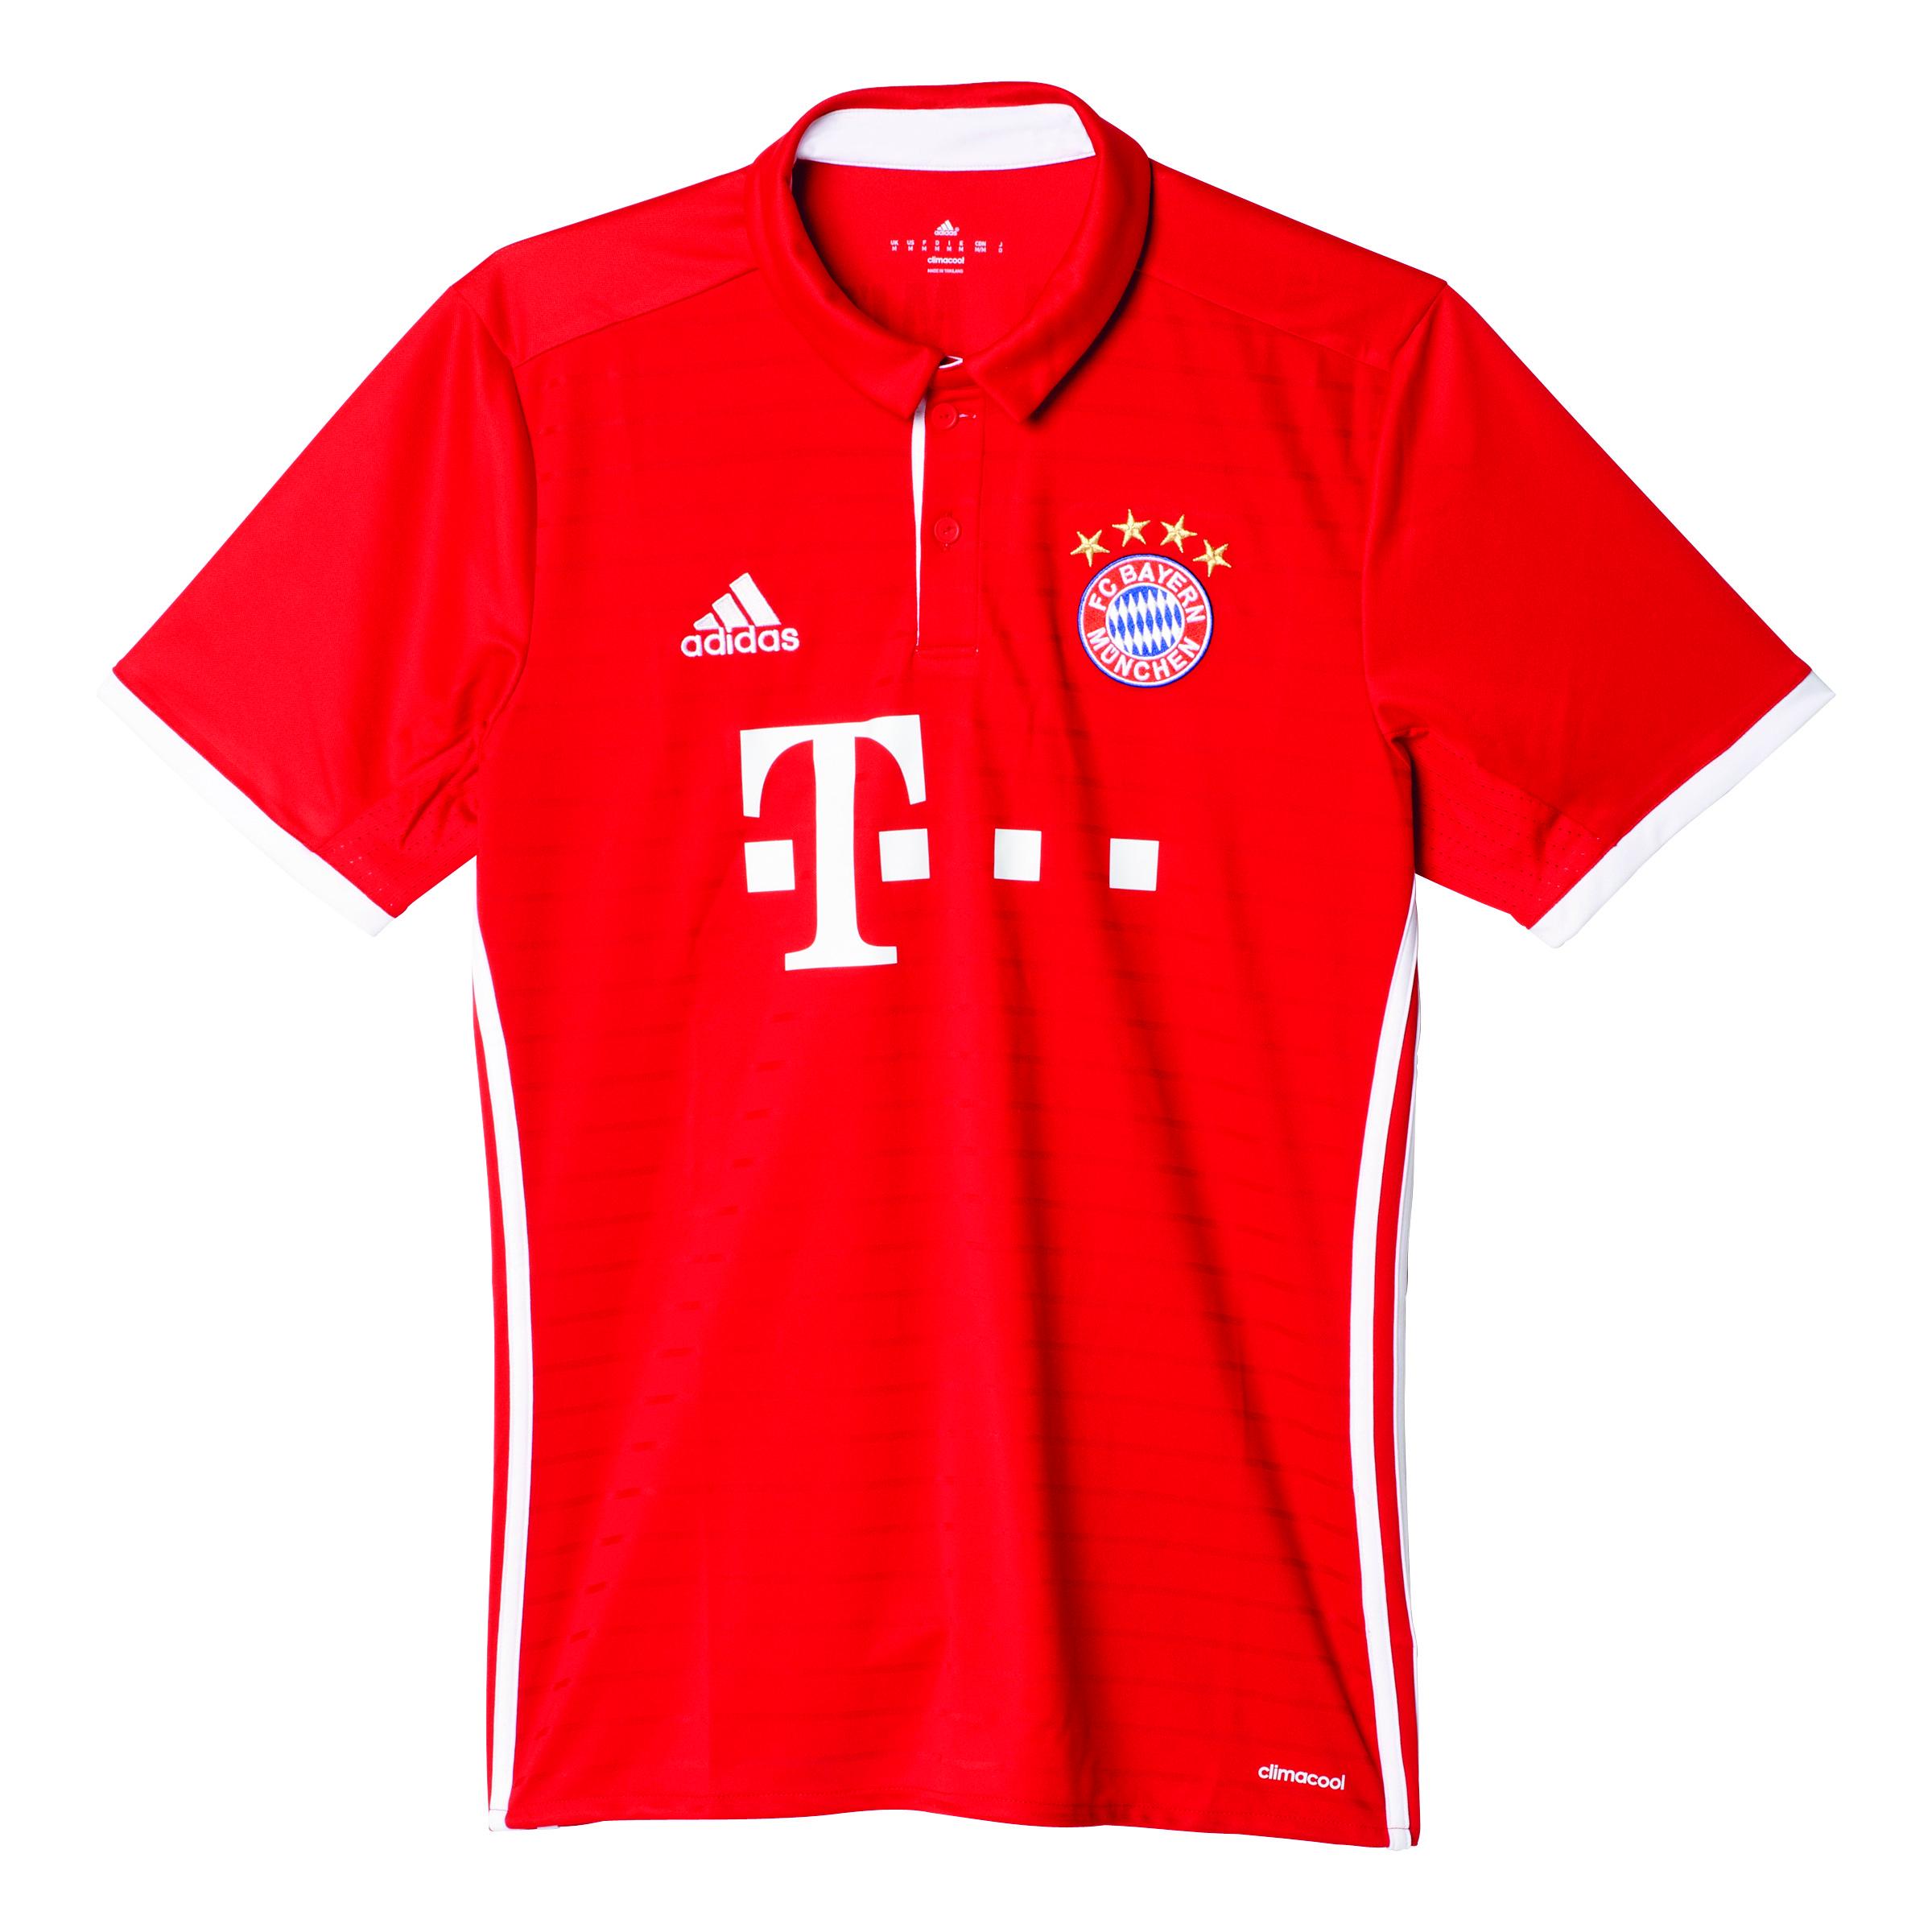 96bdd45e3ff087 ... Vorschau  adidas FC Bayern München Home Trikot Kinder 2016 2017 kurzarm  rot ...